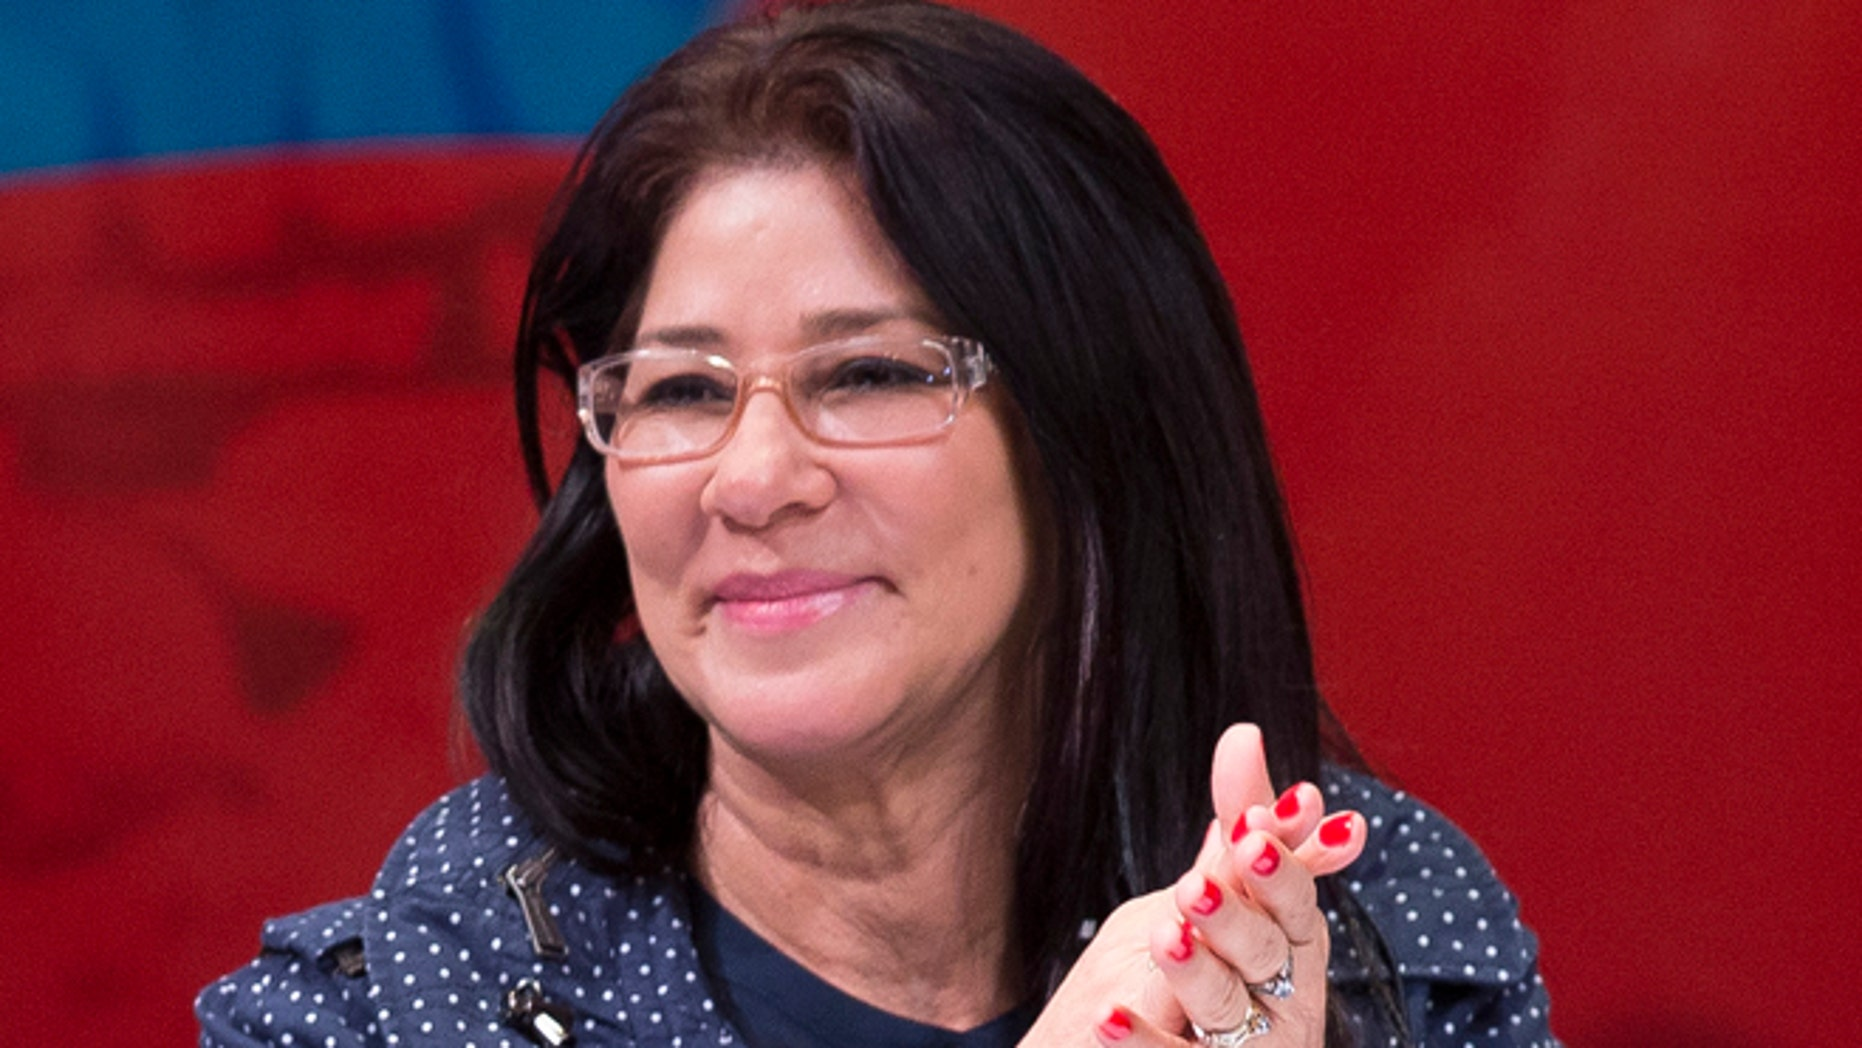 Venezuelan First Lady Cilia Flores(AP Photo/John Minchillo, File)